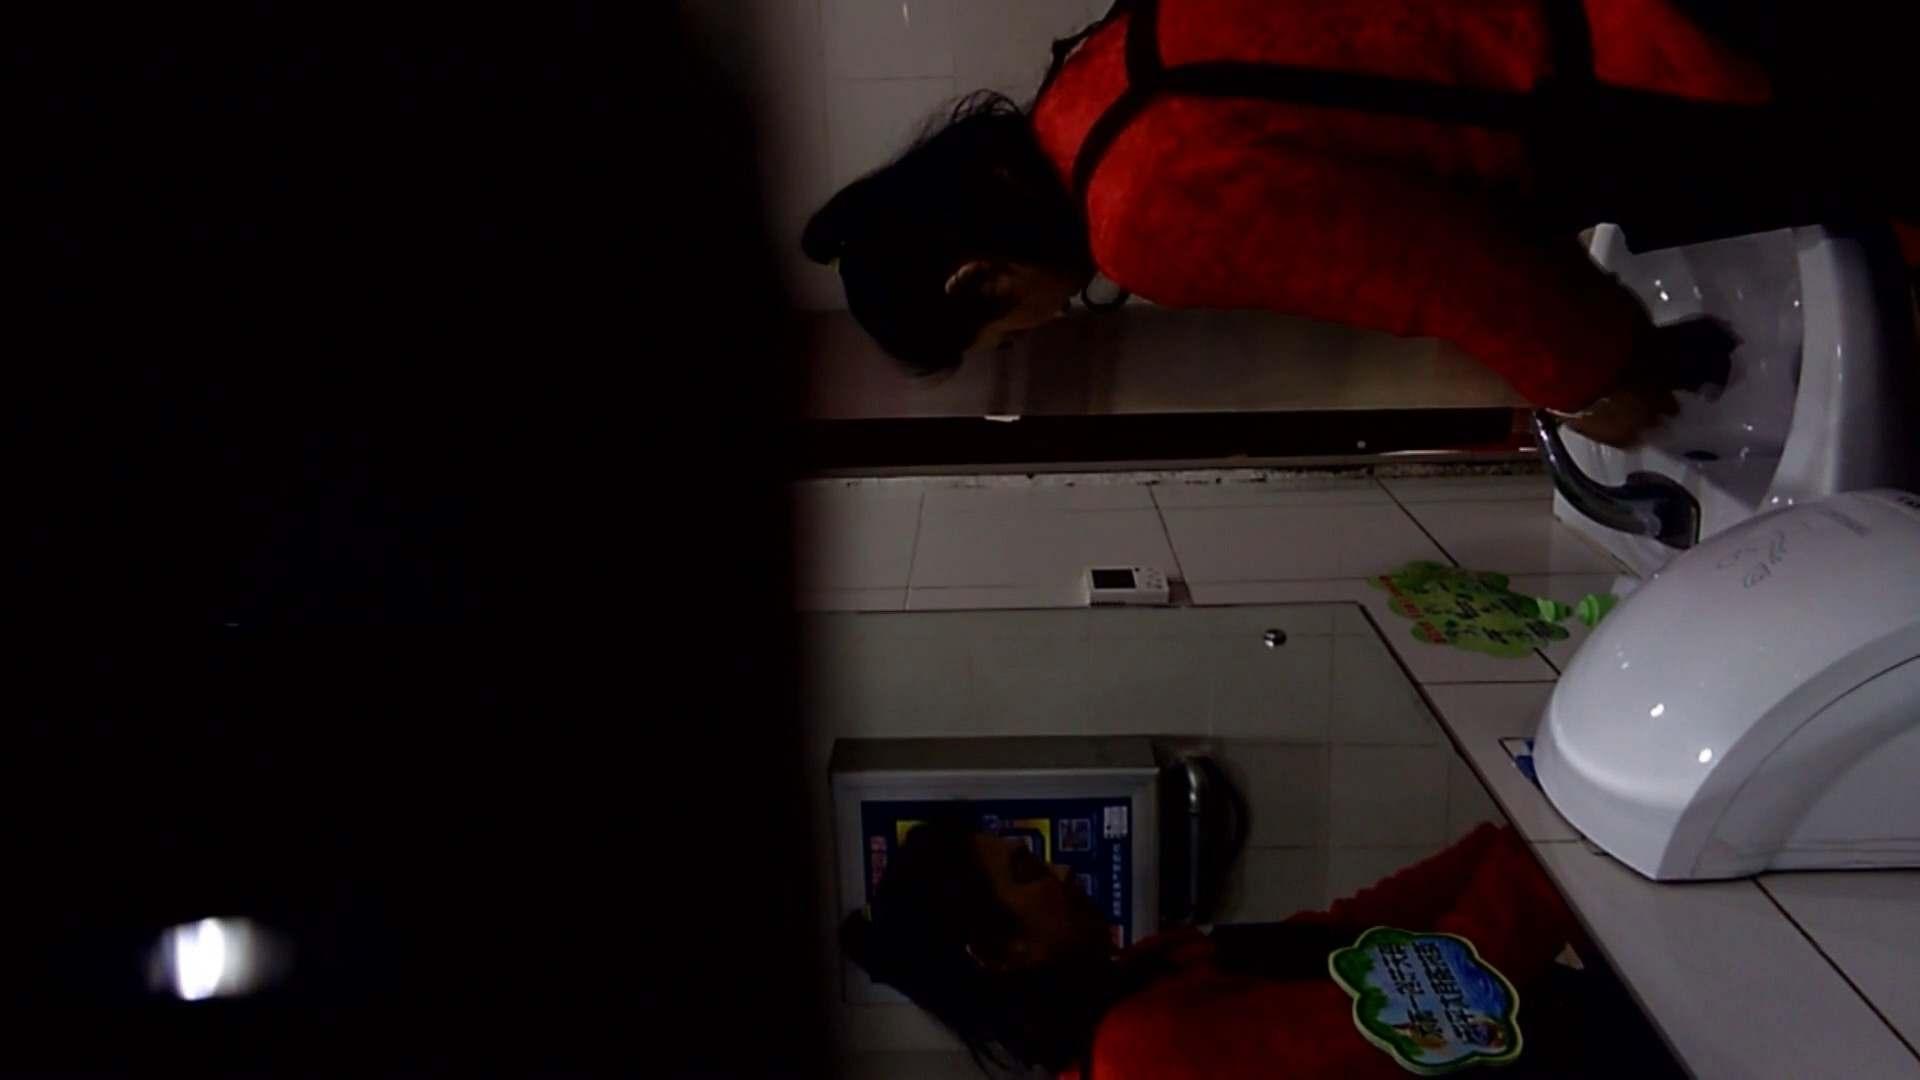 芸術大学ガチ潜入盗撮 JD盗撮 美女の洗面所の秘密 Vol.105 盗撮・必見 ワレメ無修正動画無料 90画像 80